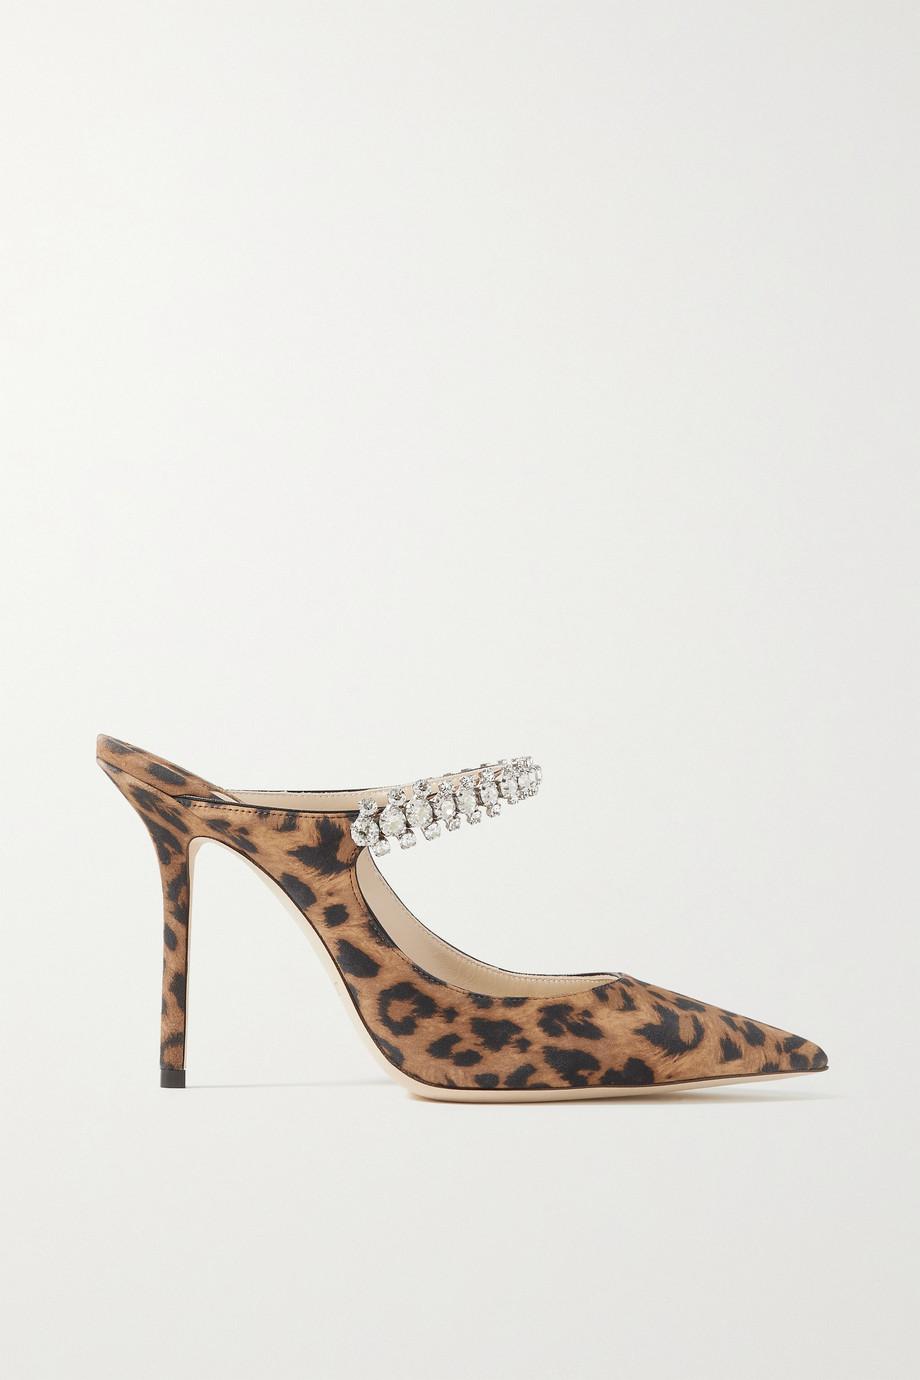 Jimmy Choo Bing 100 crystal-embellished leopard-print suede mules